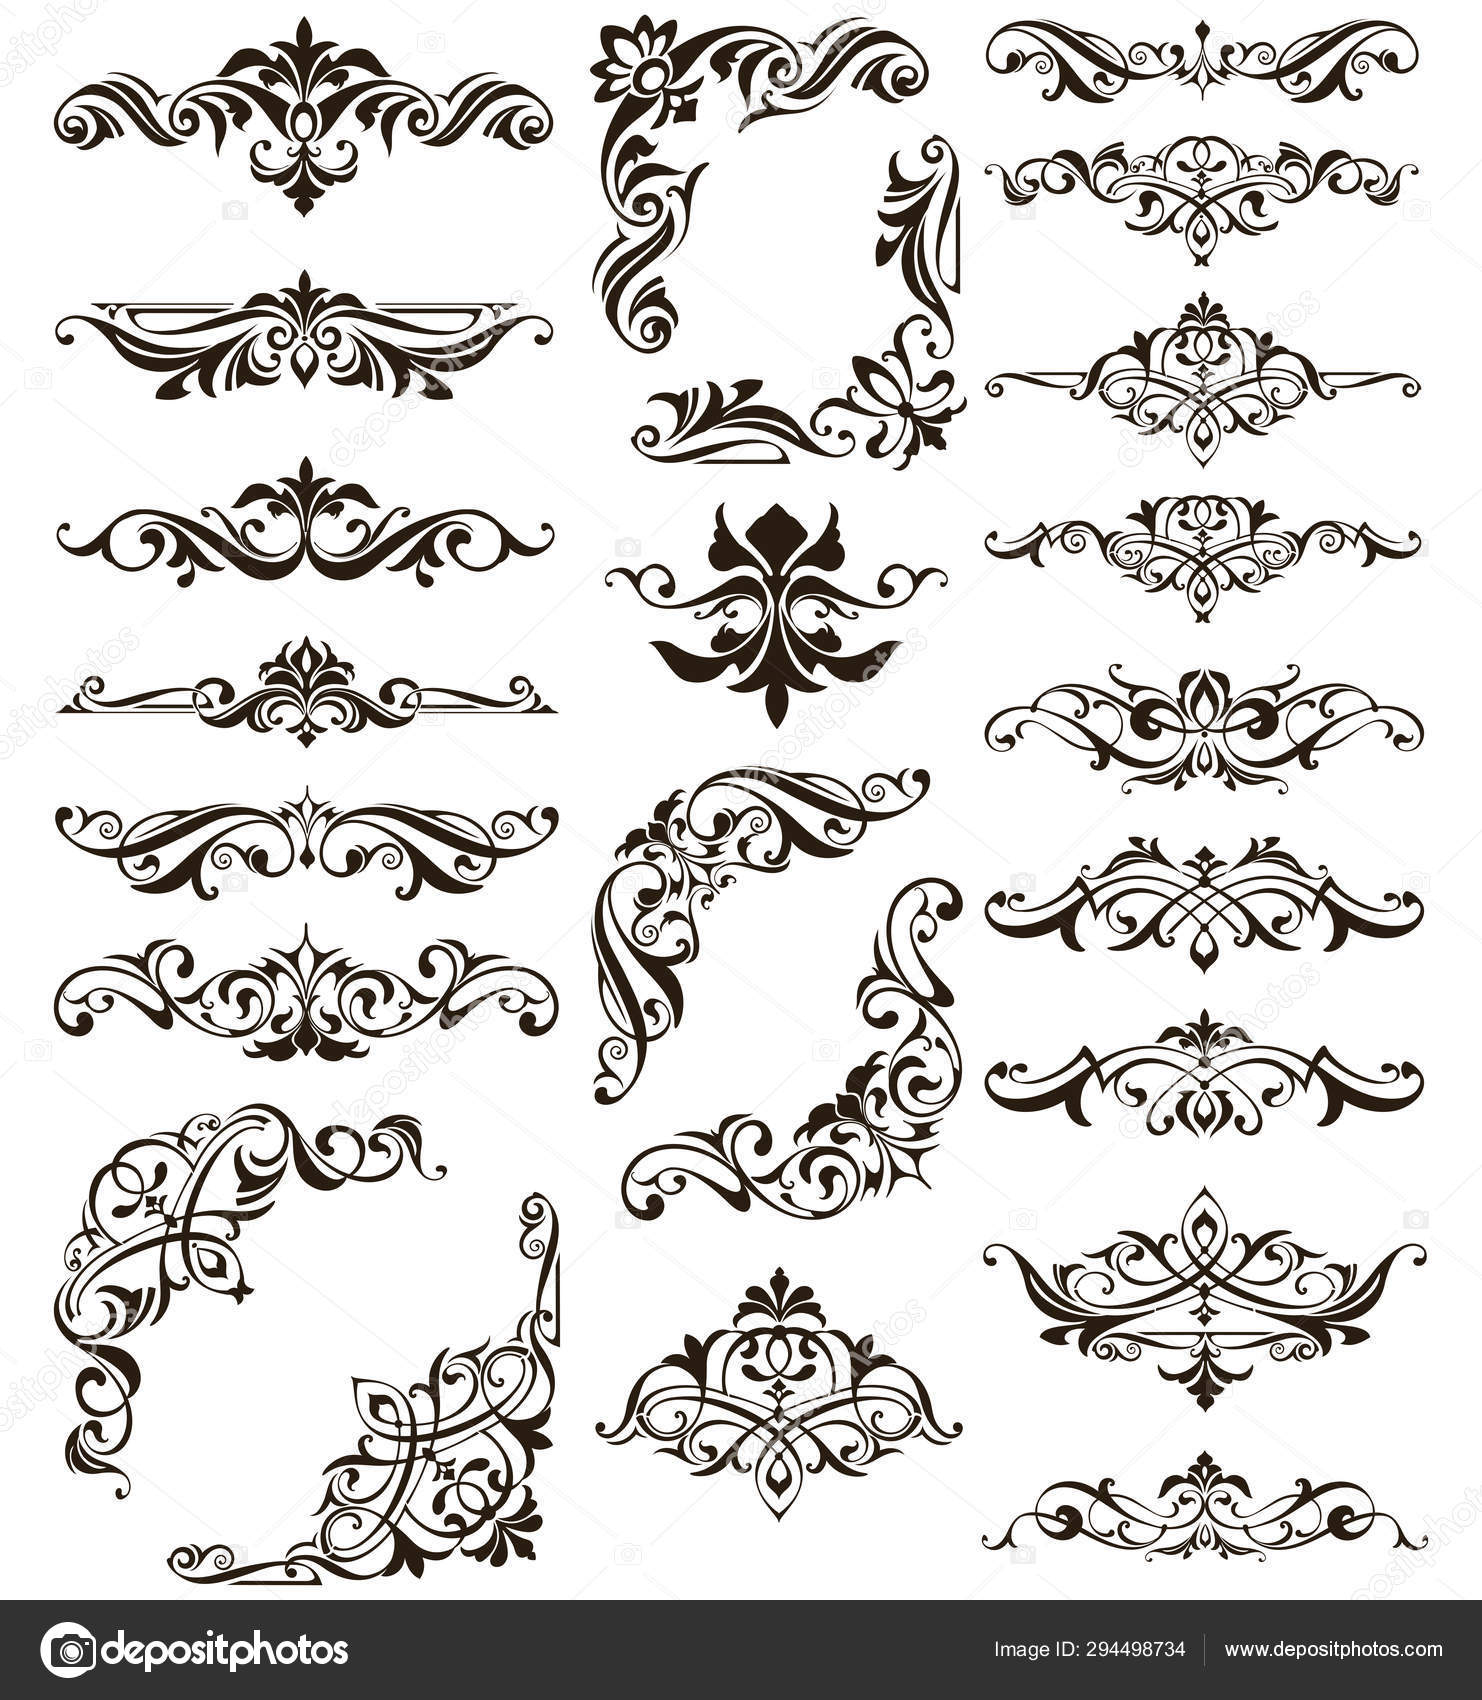 ornamental design lace borders corners vector set art deco floral stock vector c lyotta li 294498734 ornamental design lace borders corners vector set art deco floral stock vector c lyotta li 294498734